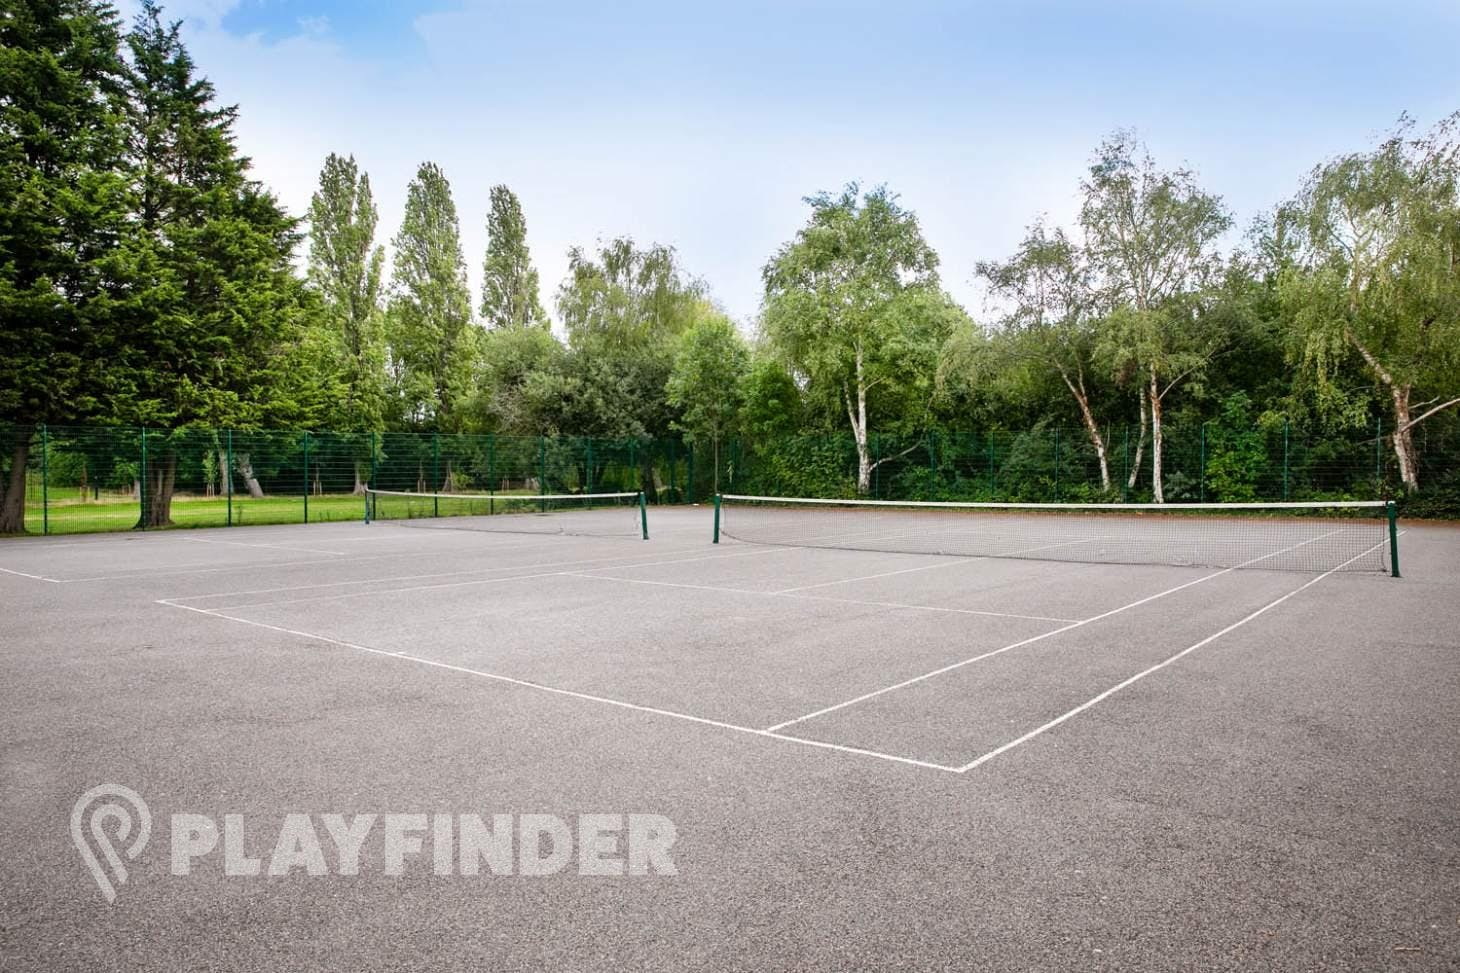 Ravenor Park Outdoor | Hard (macadam) tennis court